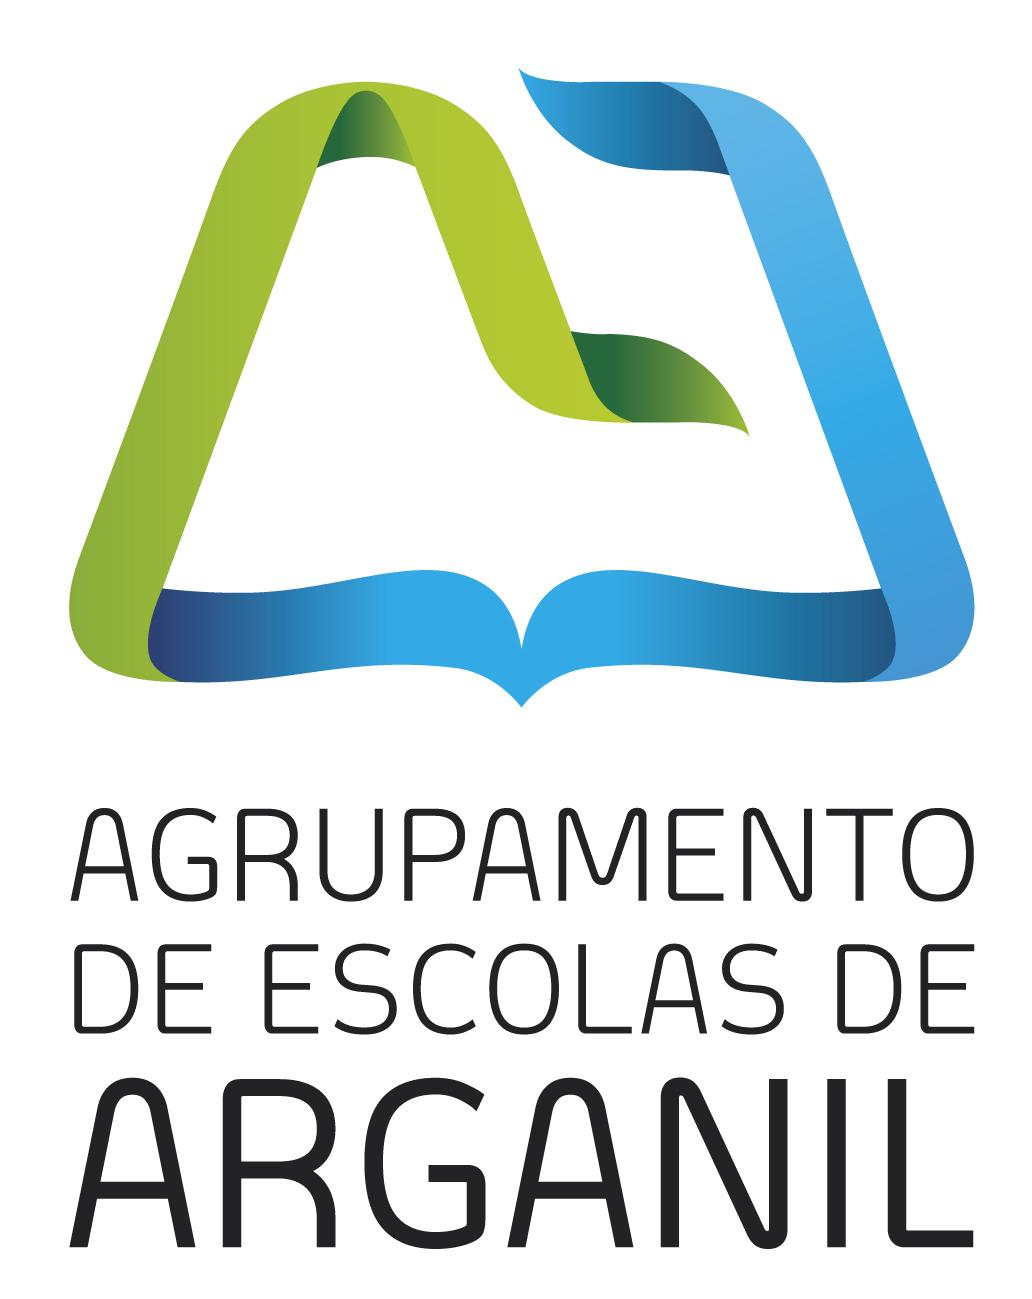 Anabela Soares/Sara Gameiro/Dalila Santos